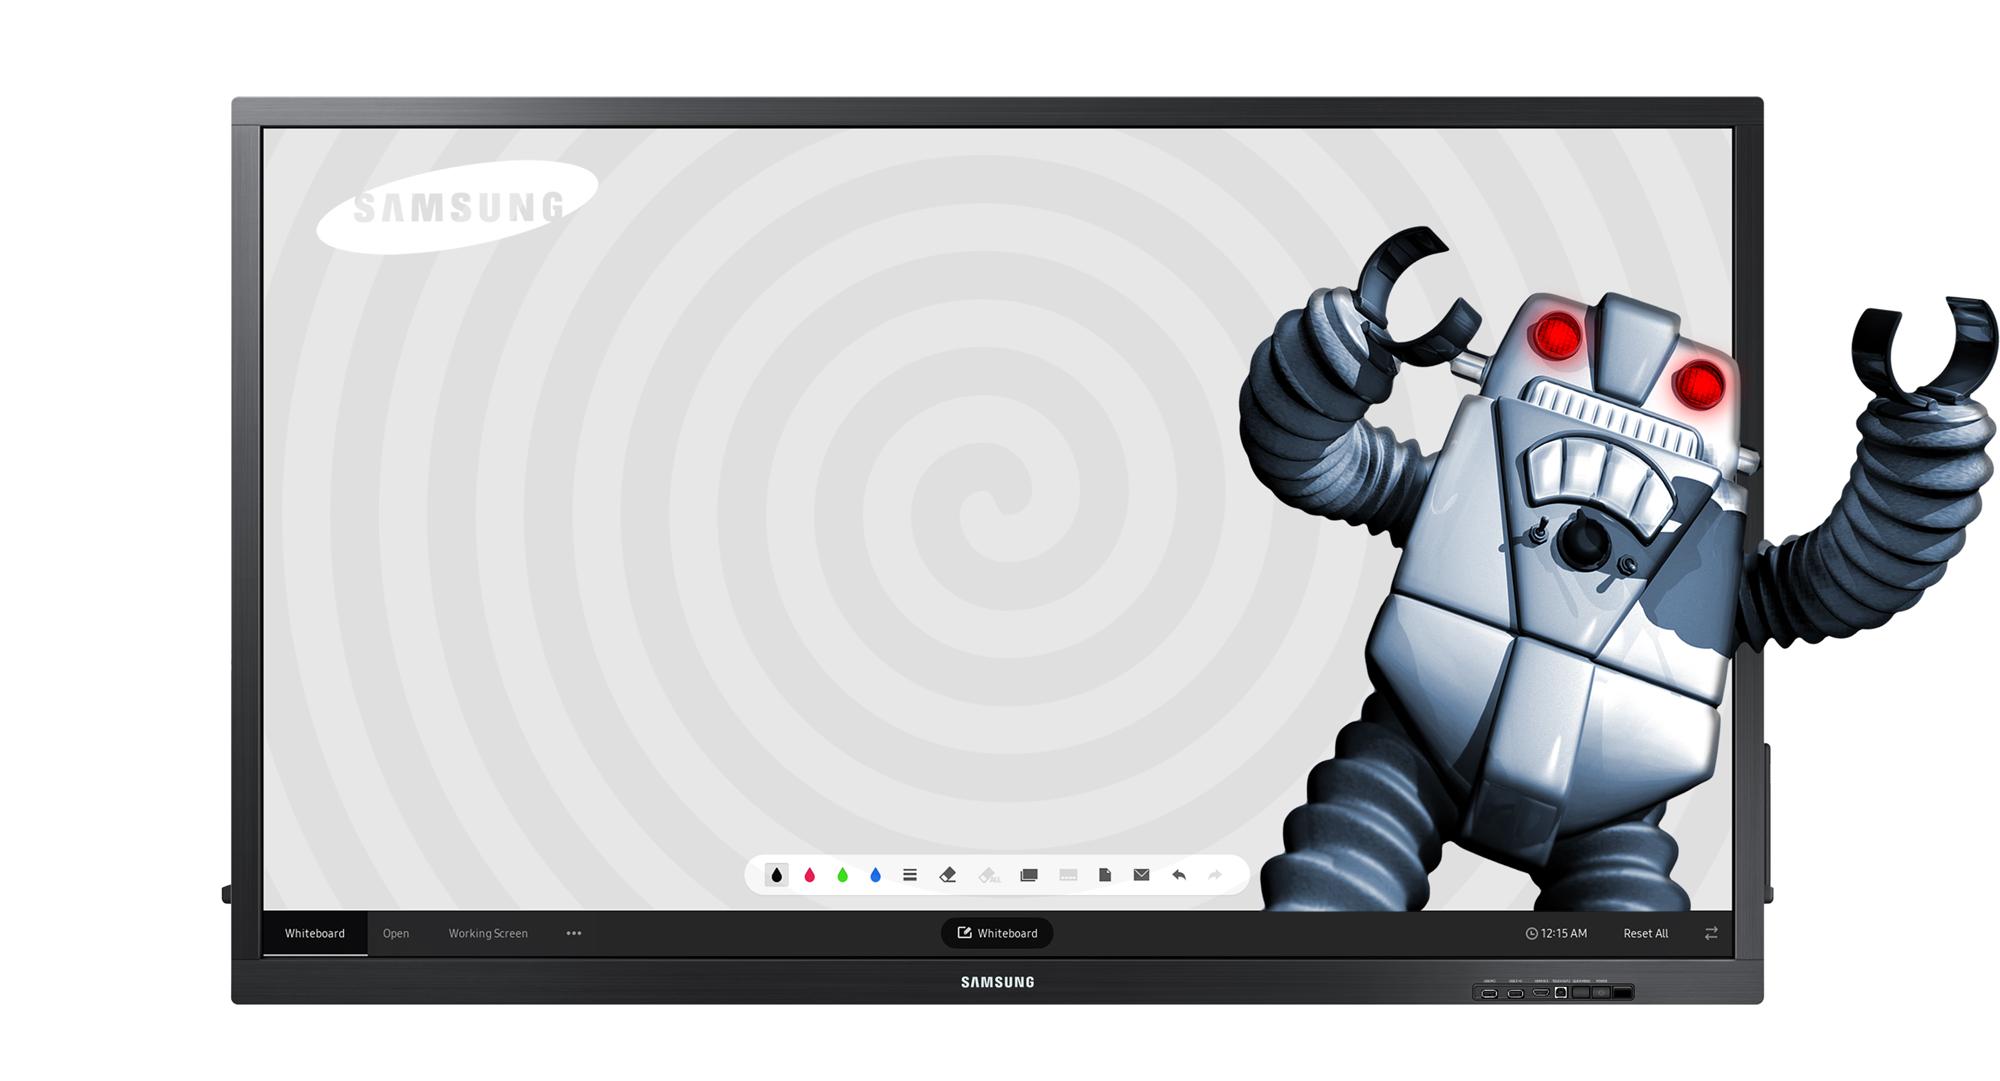 Samsung-QB65H-TR-front-w-robot-jpg.jpg